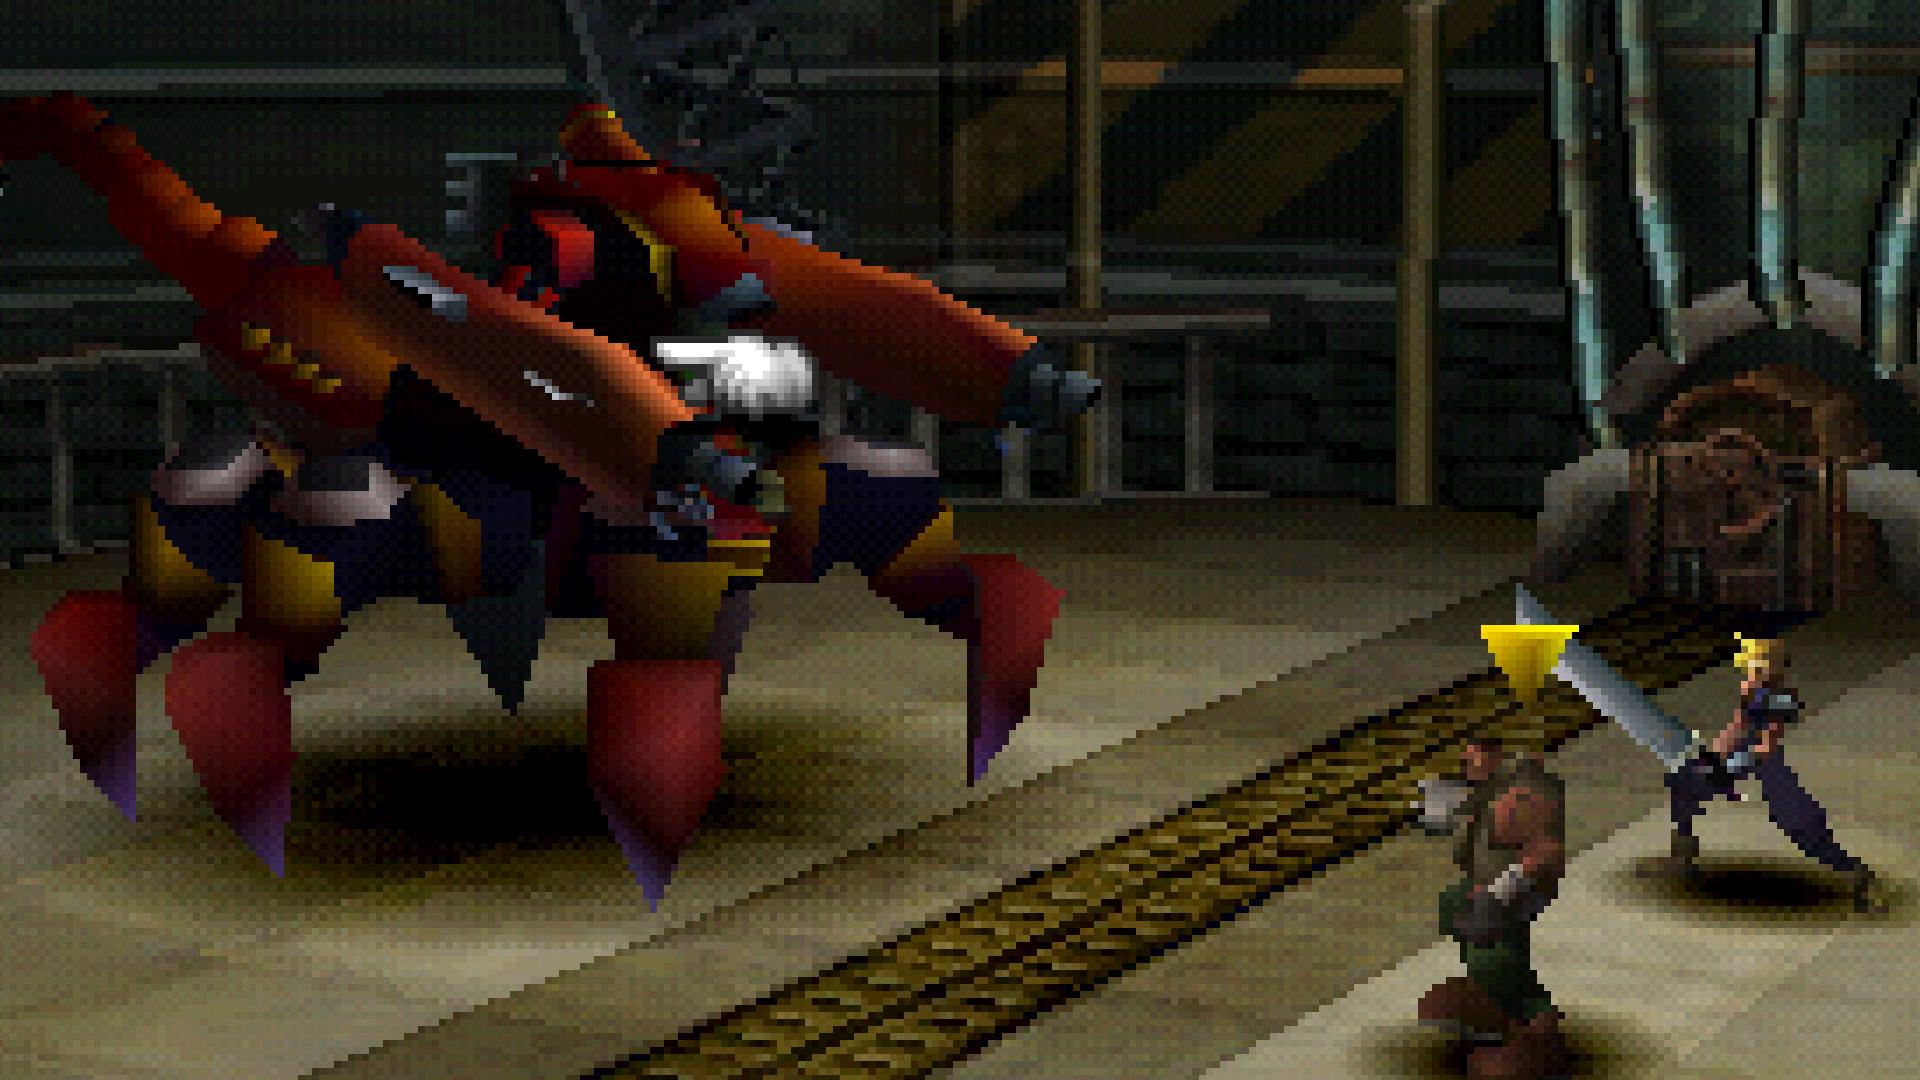 Two men fighting a scorpion robot